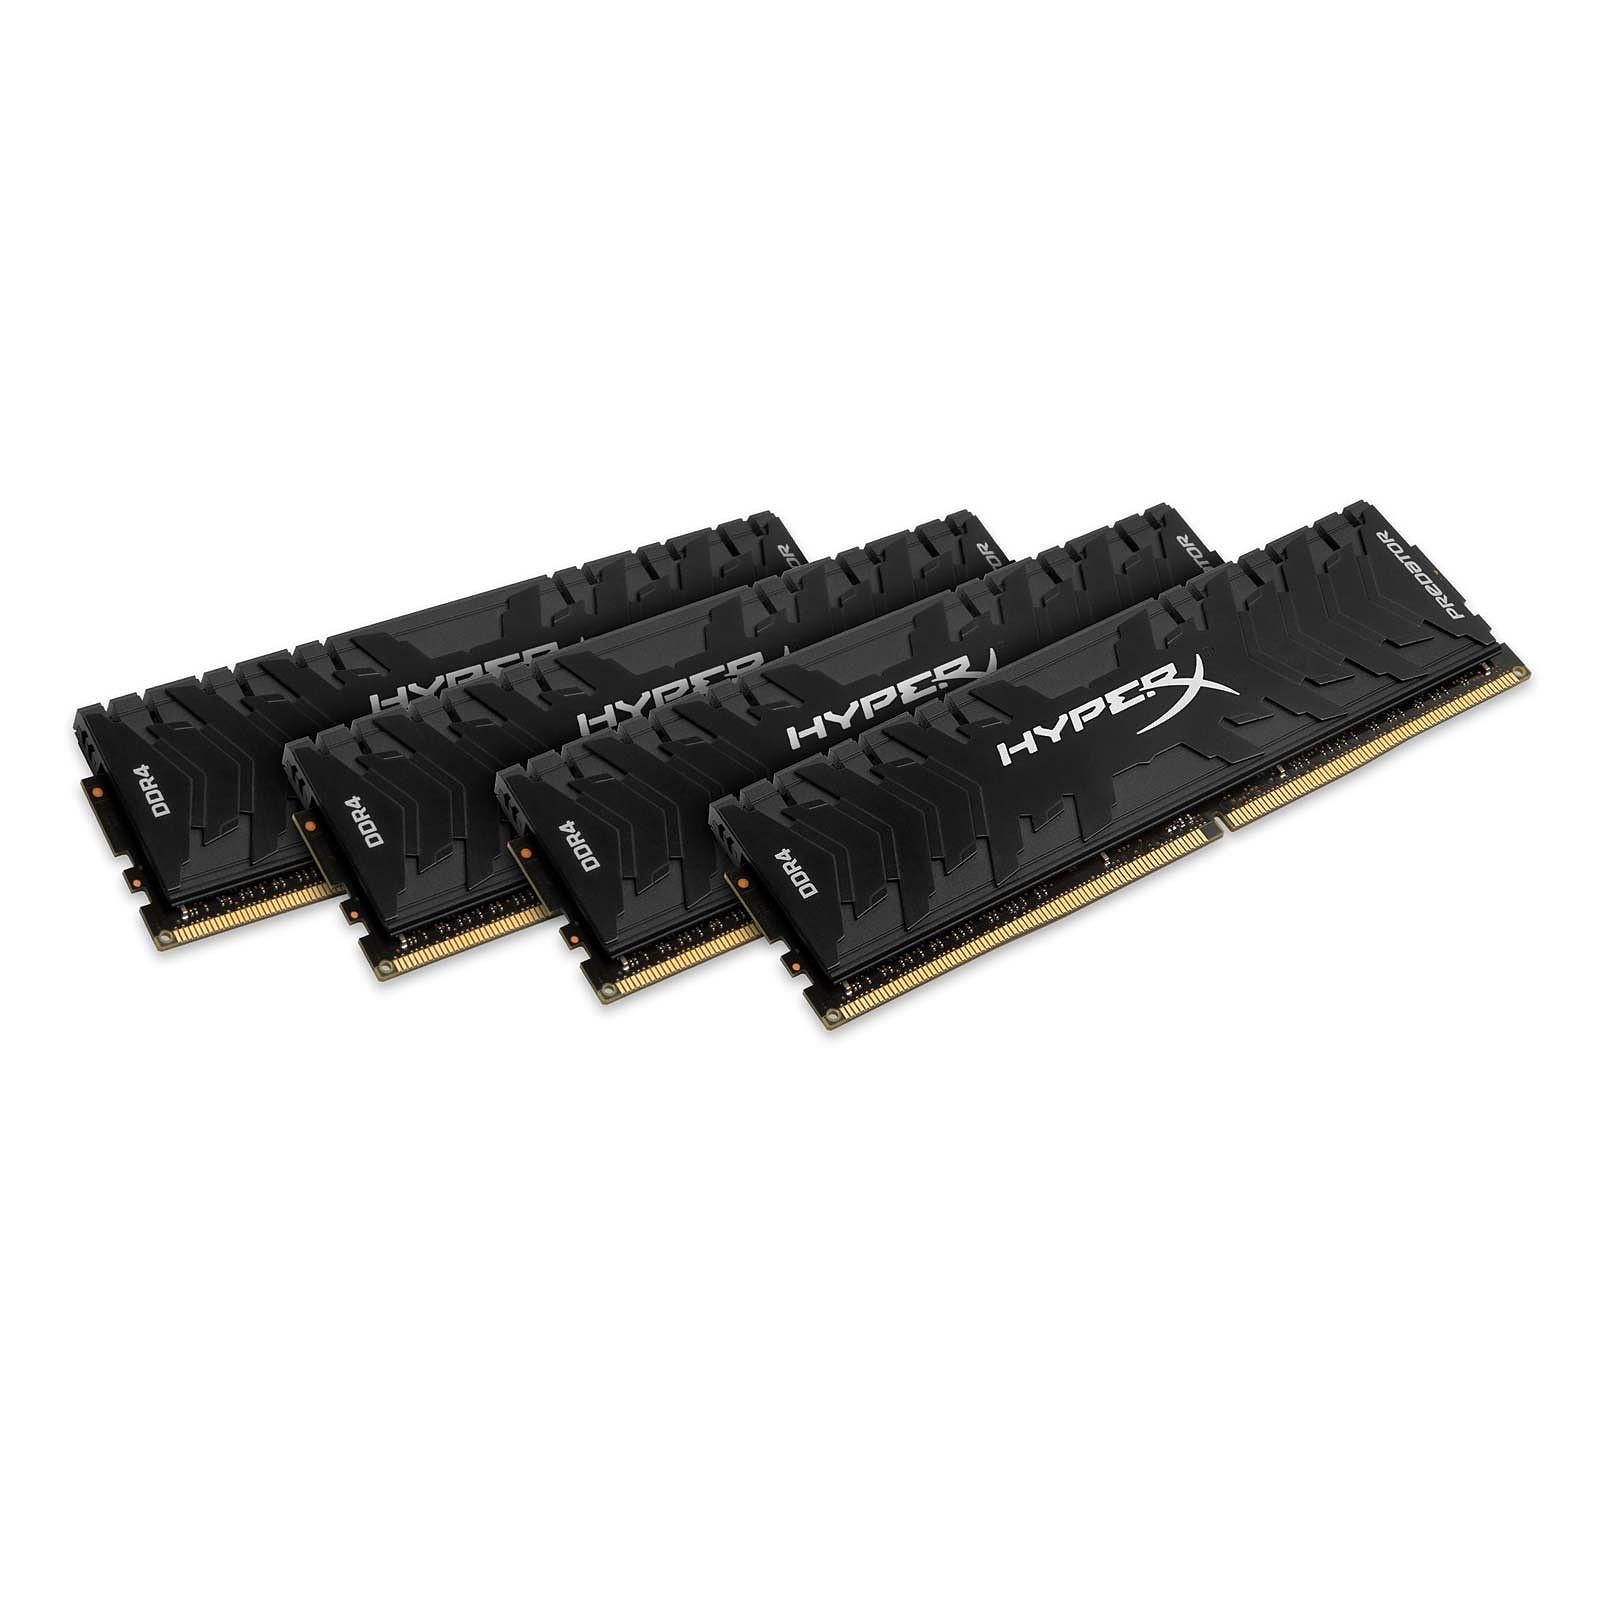 HyperX Predator Noir 32 Go (4x 8 Go) DDR4 3600 MHz CL17